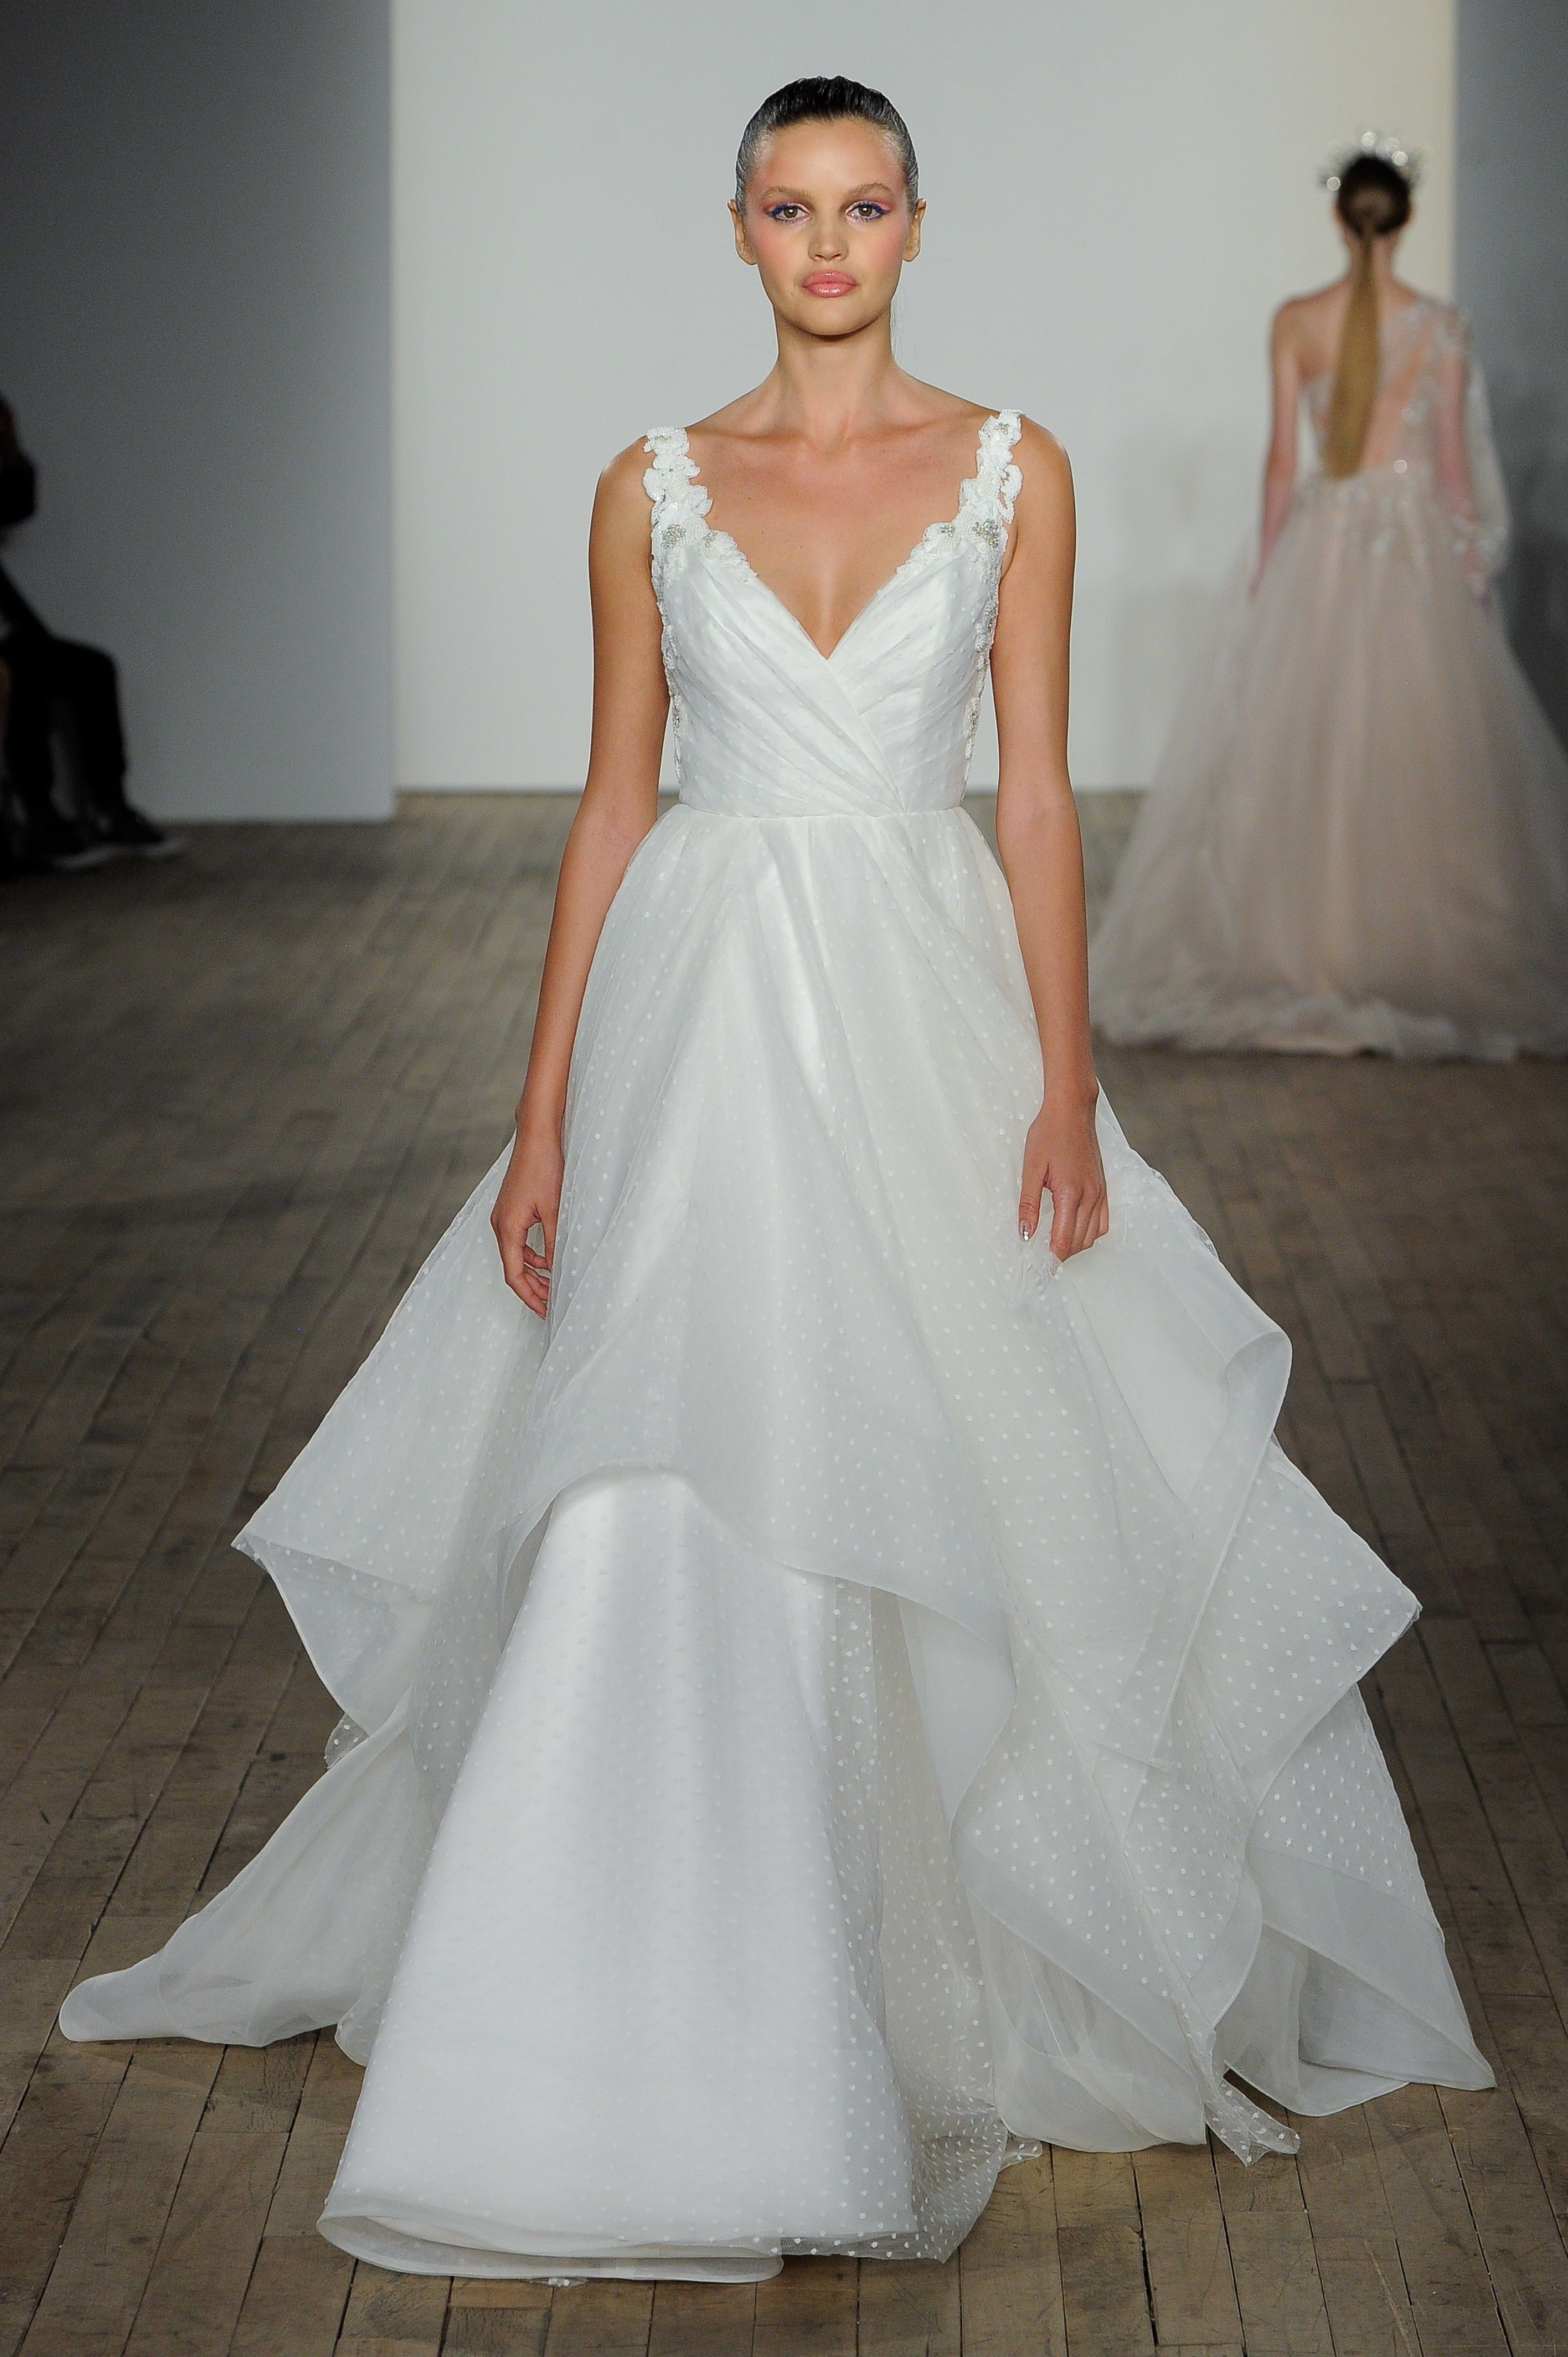 Hayley paige bridal fall wedding ideas in pinterest